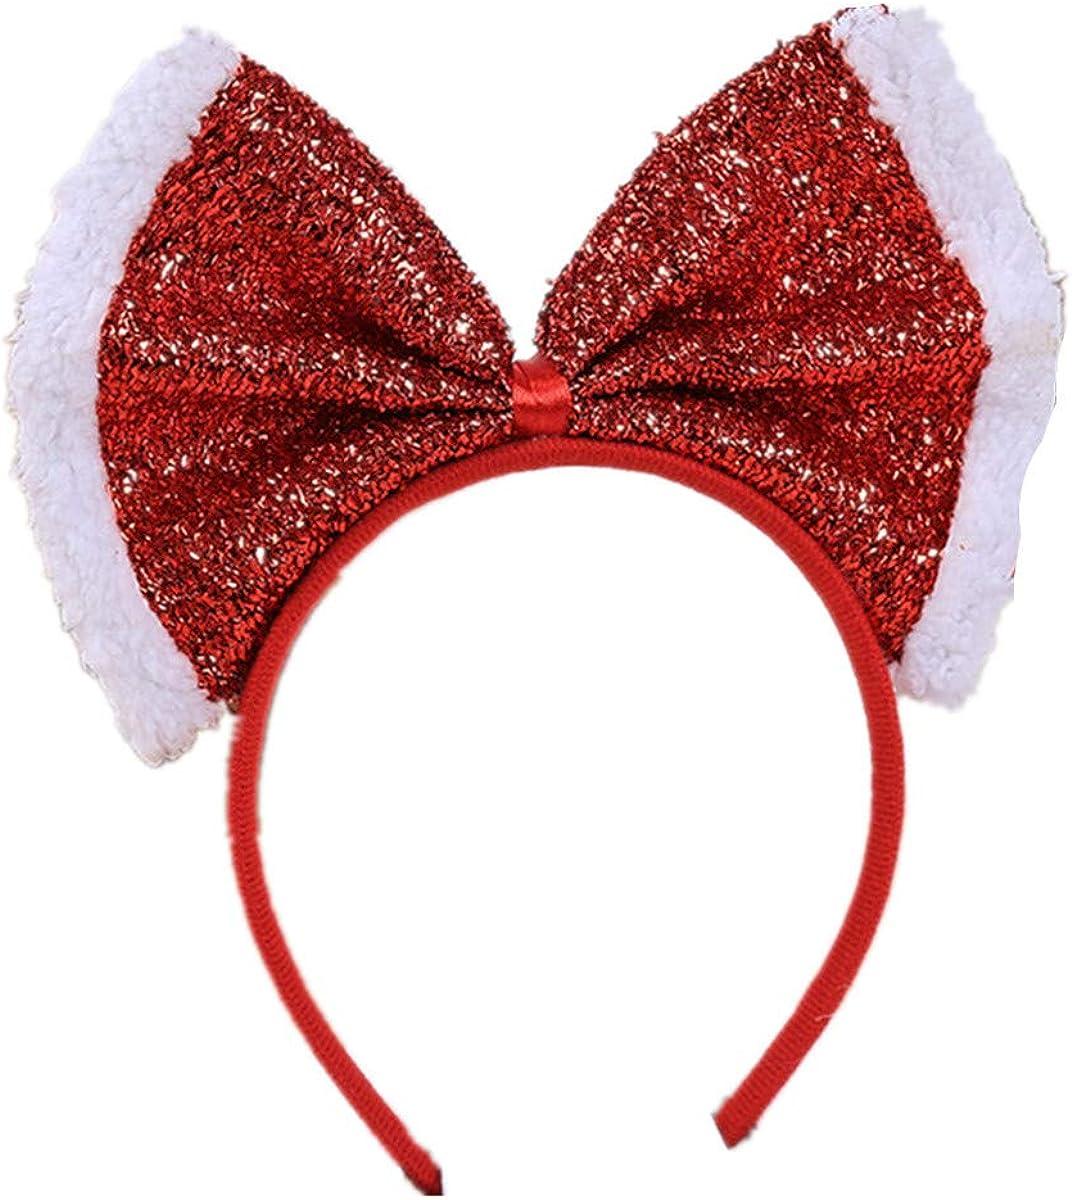 WINZIK Christmas Headwear Gingerbread Man Striped Bowknot Hair Hoop Cute Headband Xmas Holiday Party Supplies Gifts